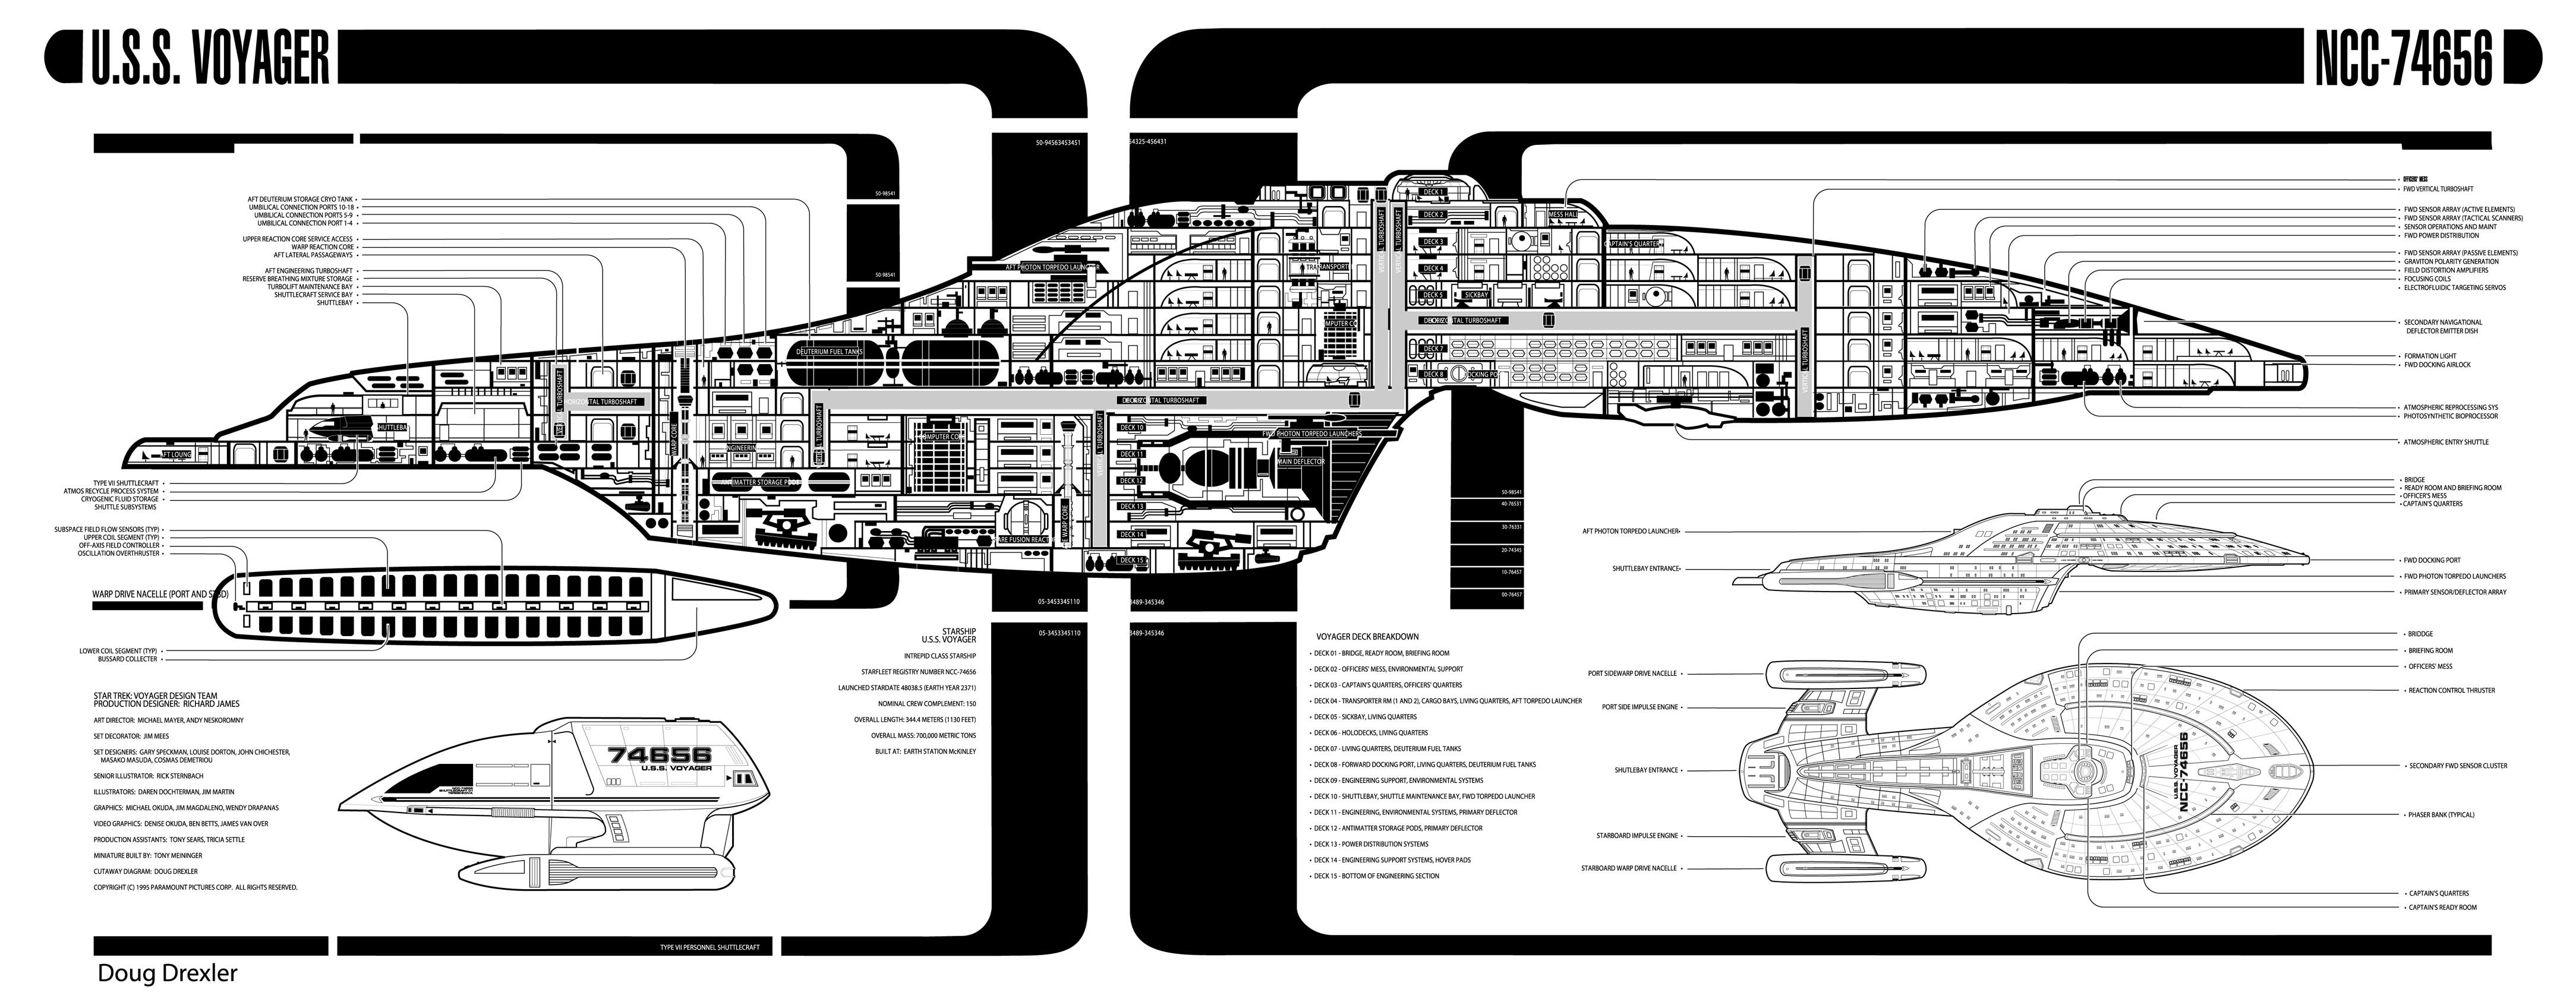 Fondos de pantalla : dibujo, ilustración, arte lineal ... on galaxy star trek lcars schematics, star trek prometheus schematics, deep space nine schematics, uss enterprise schematics, delta flyer schematics, sci-fi spaceship schematics, ship schematics, gilso star trek schematics, federation runabout schematics, starship schematics, star trek enterprise schematics, babylon 5 schematics, seaquest dsv schematics,